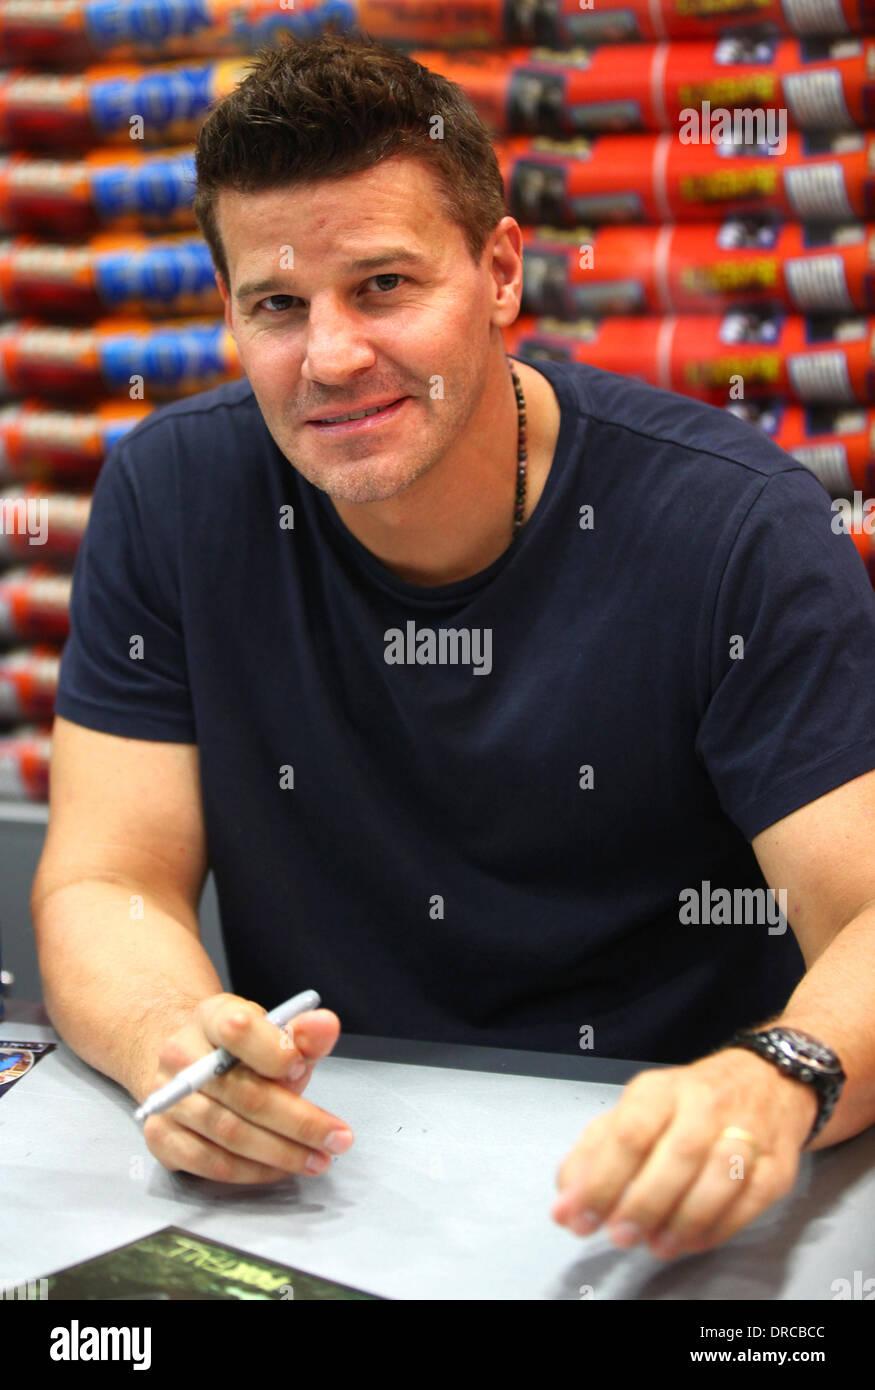 David Boreanaz San Diego Comic-Con 2012 - 'Bones' - Booth Signing